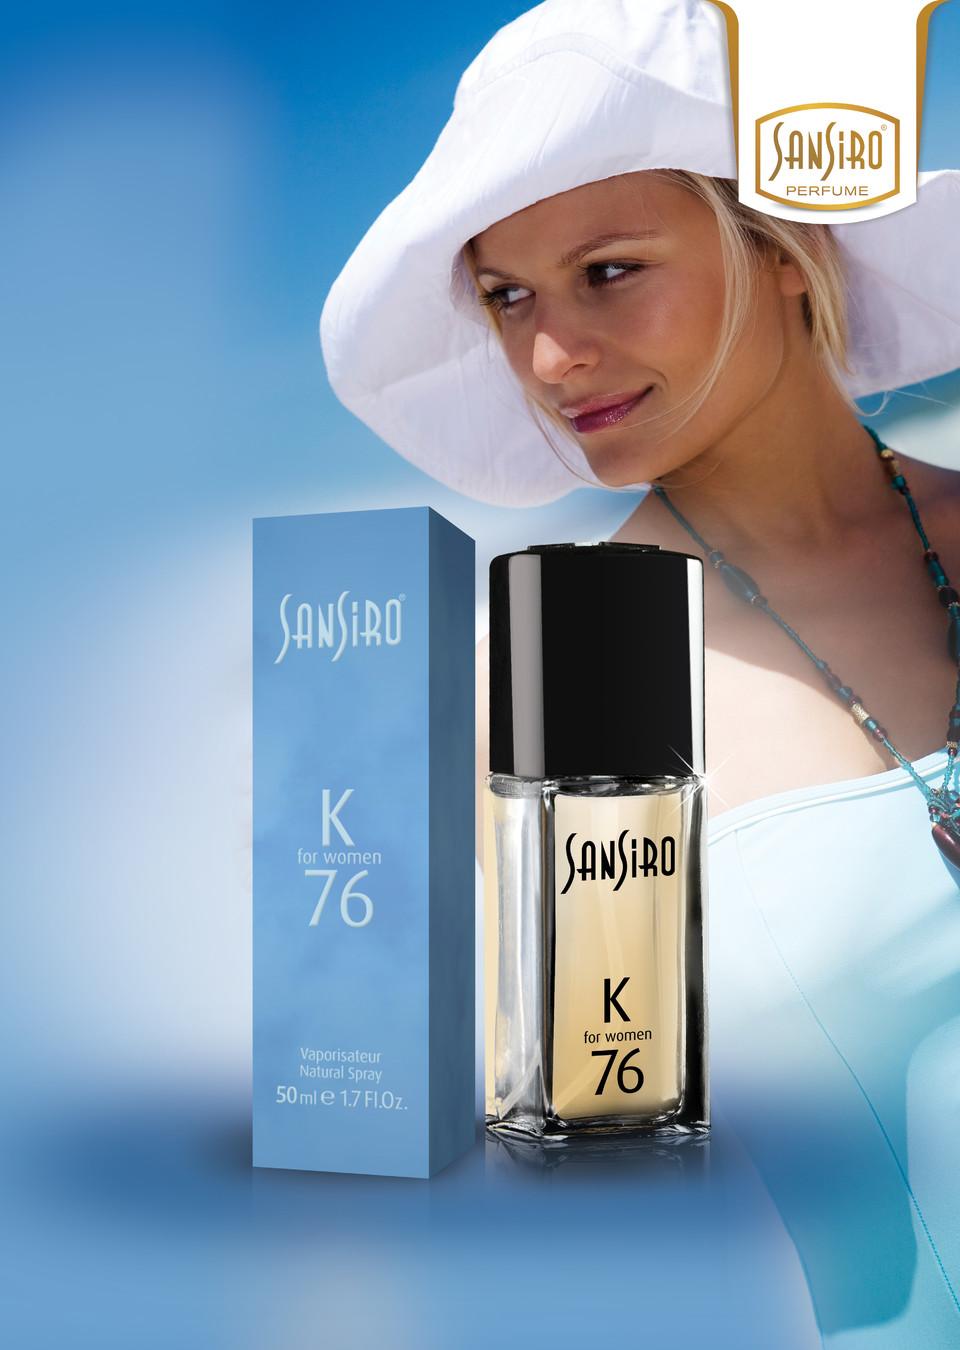 Sansiro Perfume - For Women - Marvis Woman (K76)